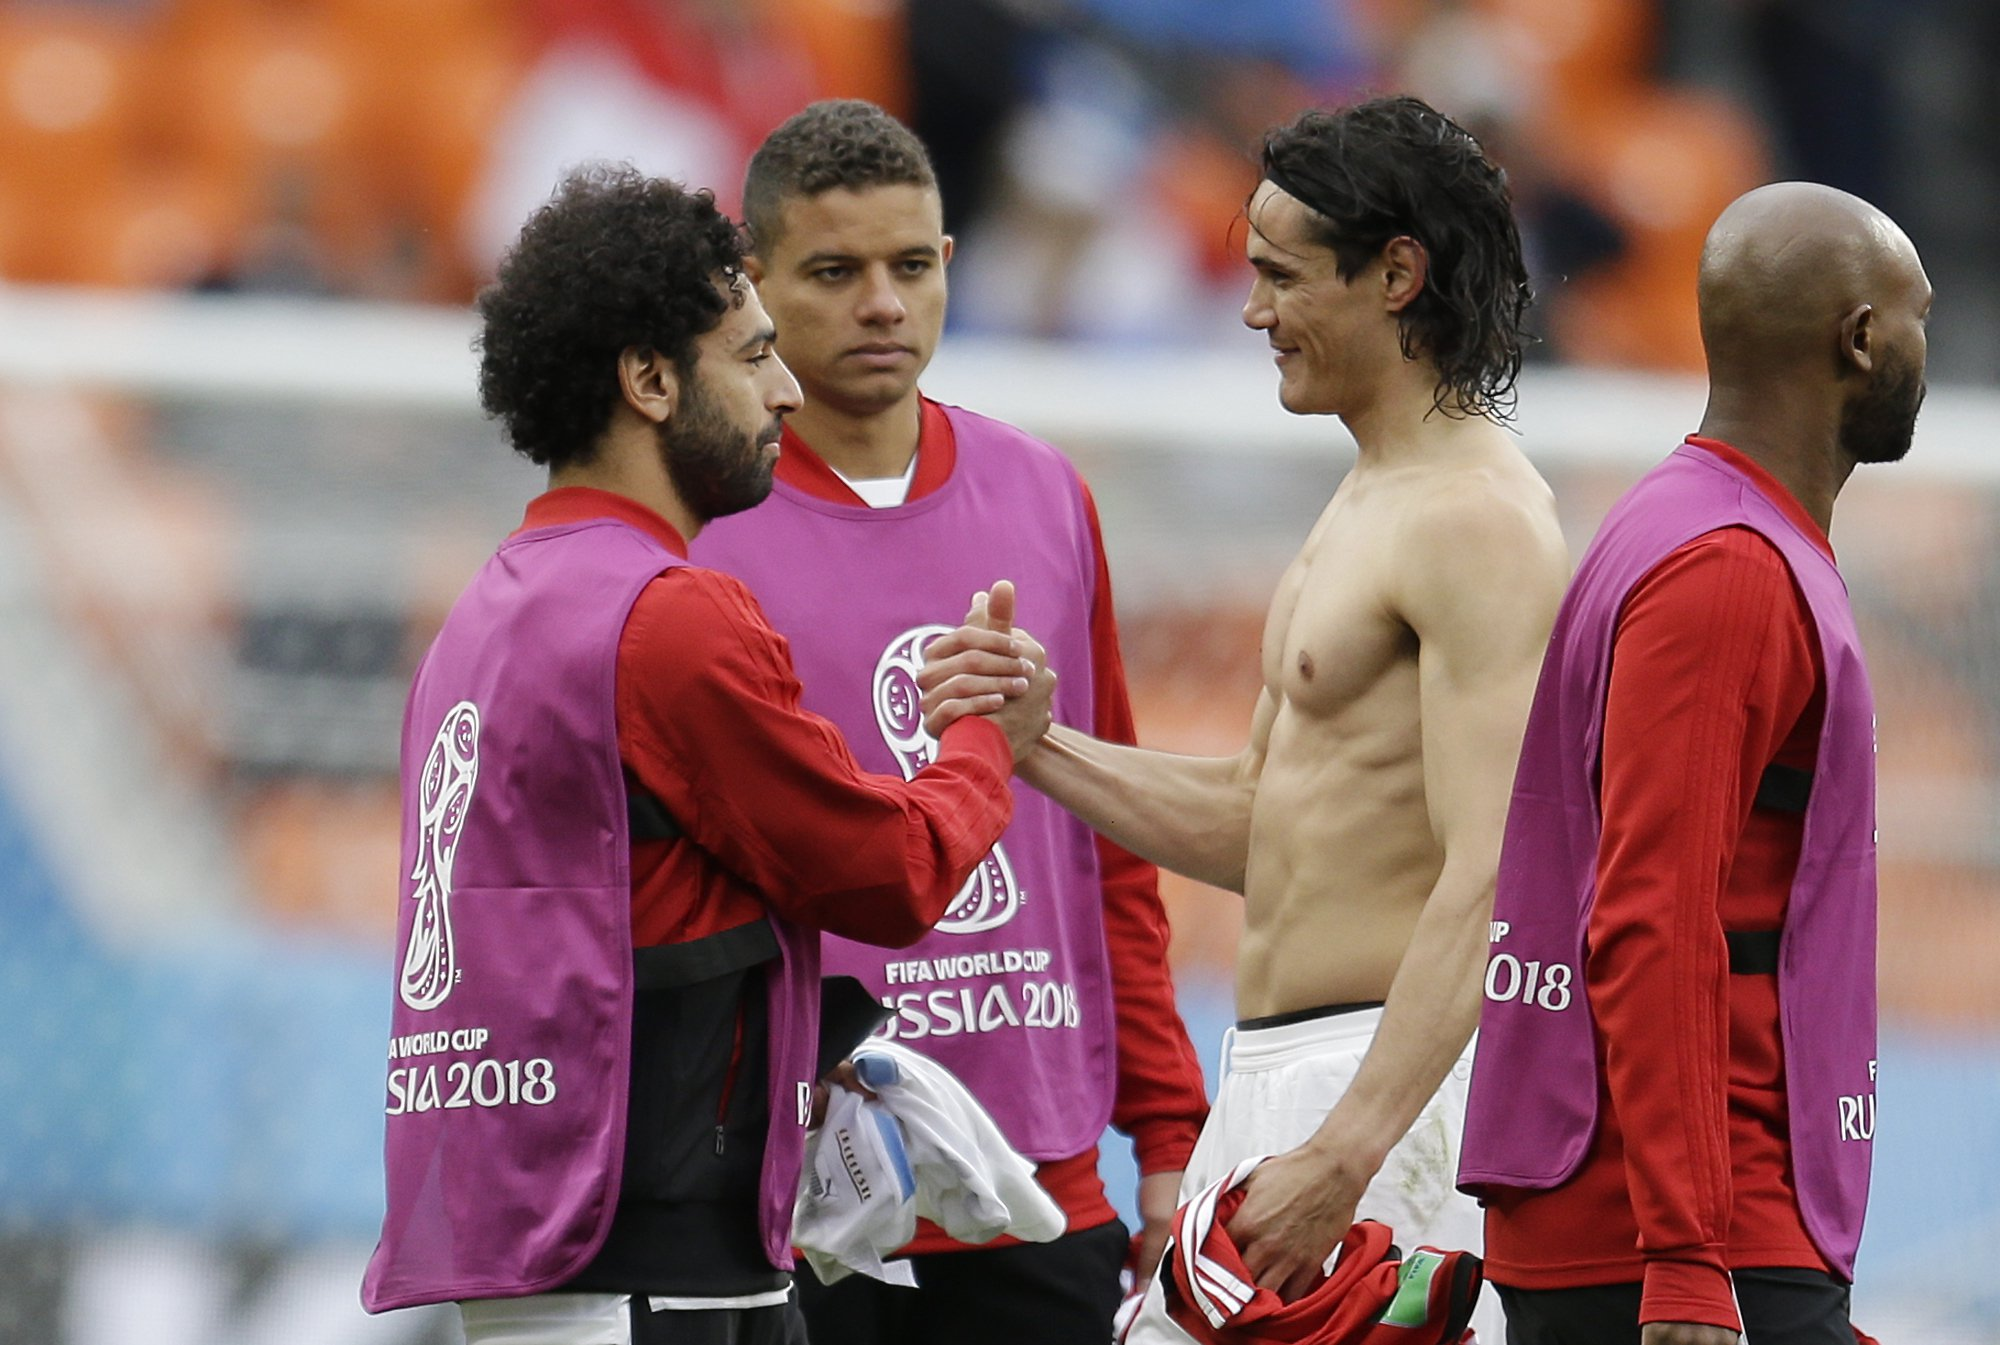 Edinson Cavani reveals his class reason for wanting Mohamed Salah's shirt